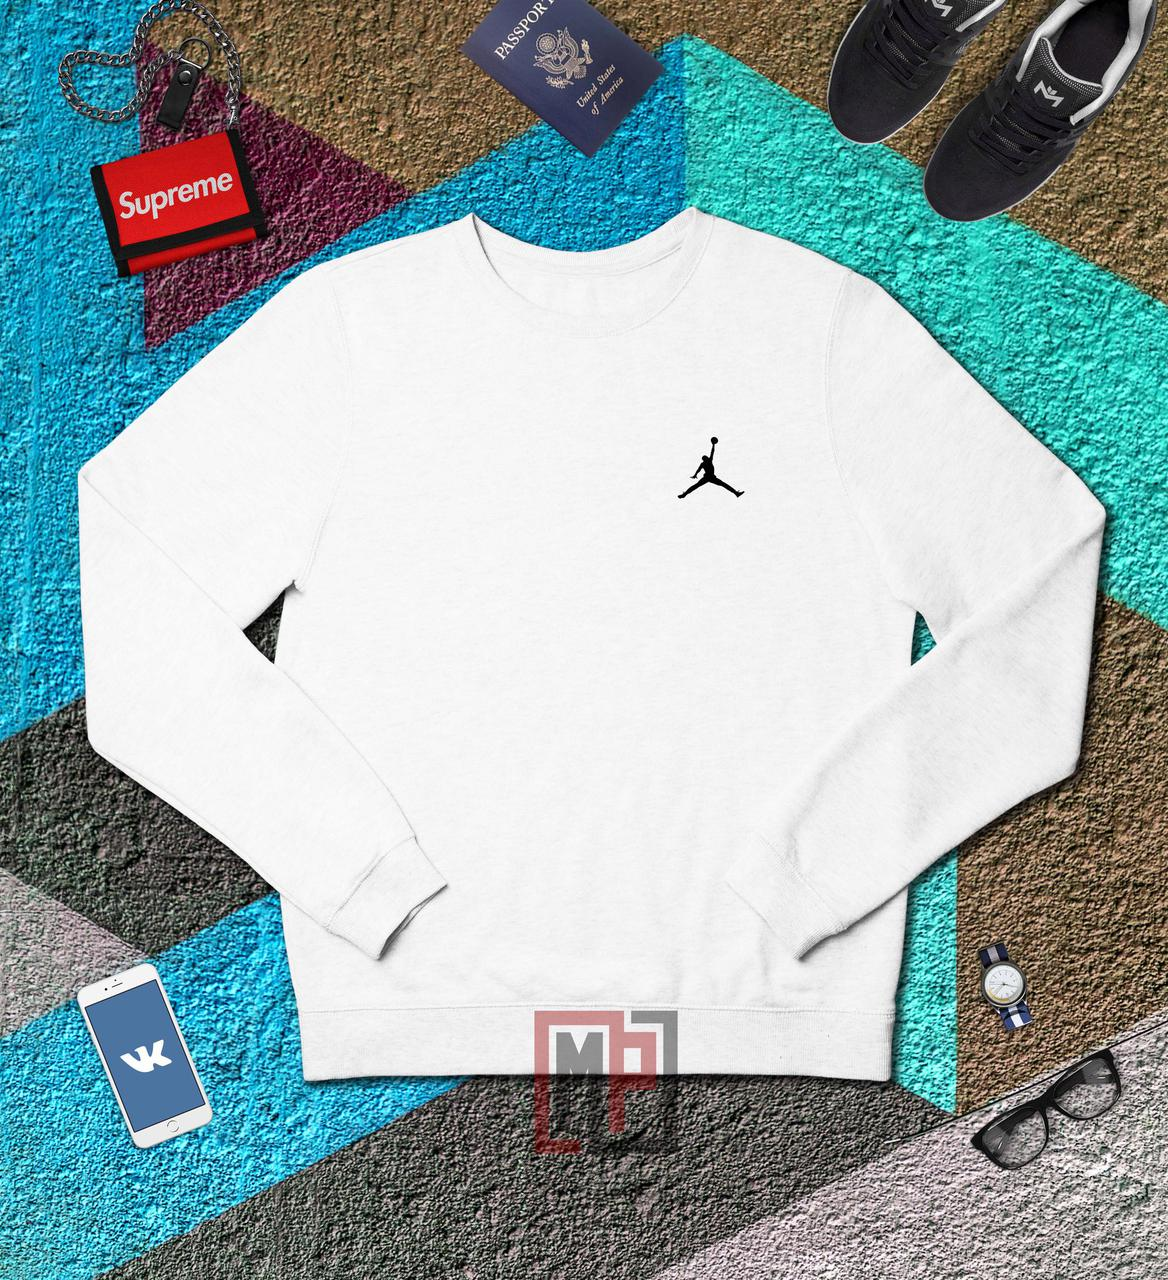 ac0241a9 Свитшот Air Jordan   белый   толстовка   реглан   реплика -  Интернет-магазин хайповой